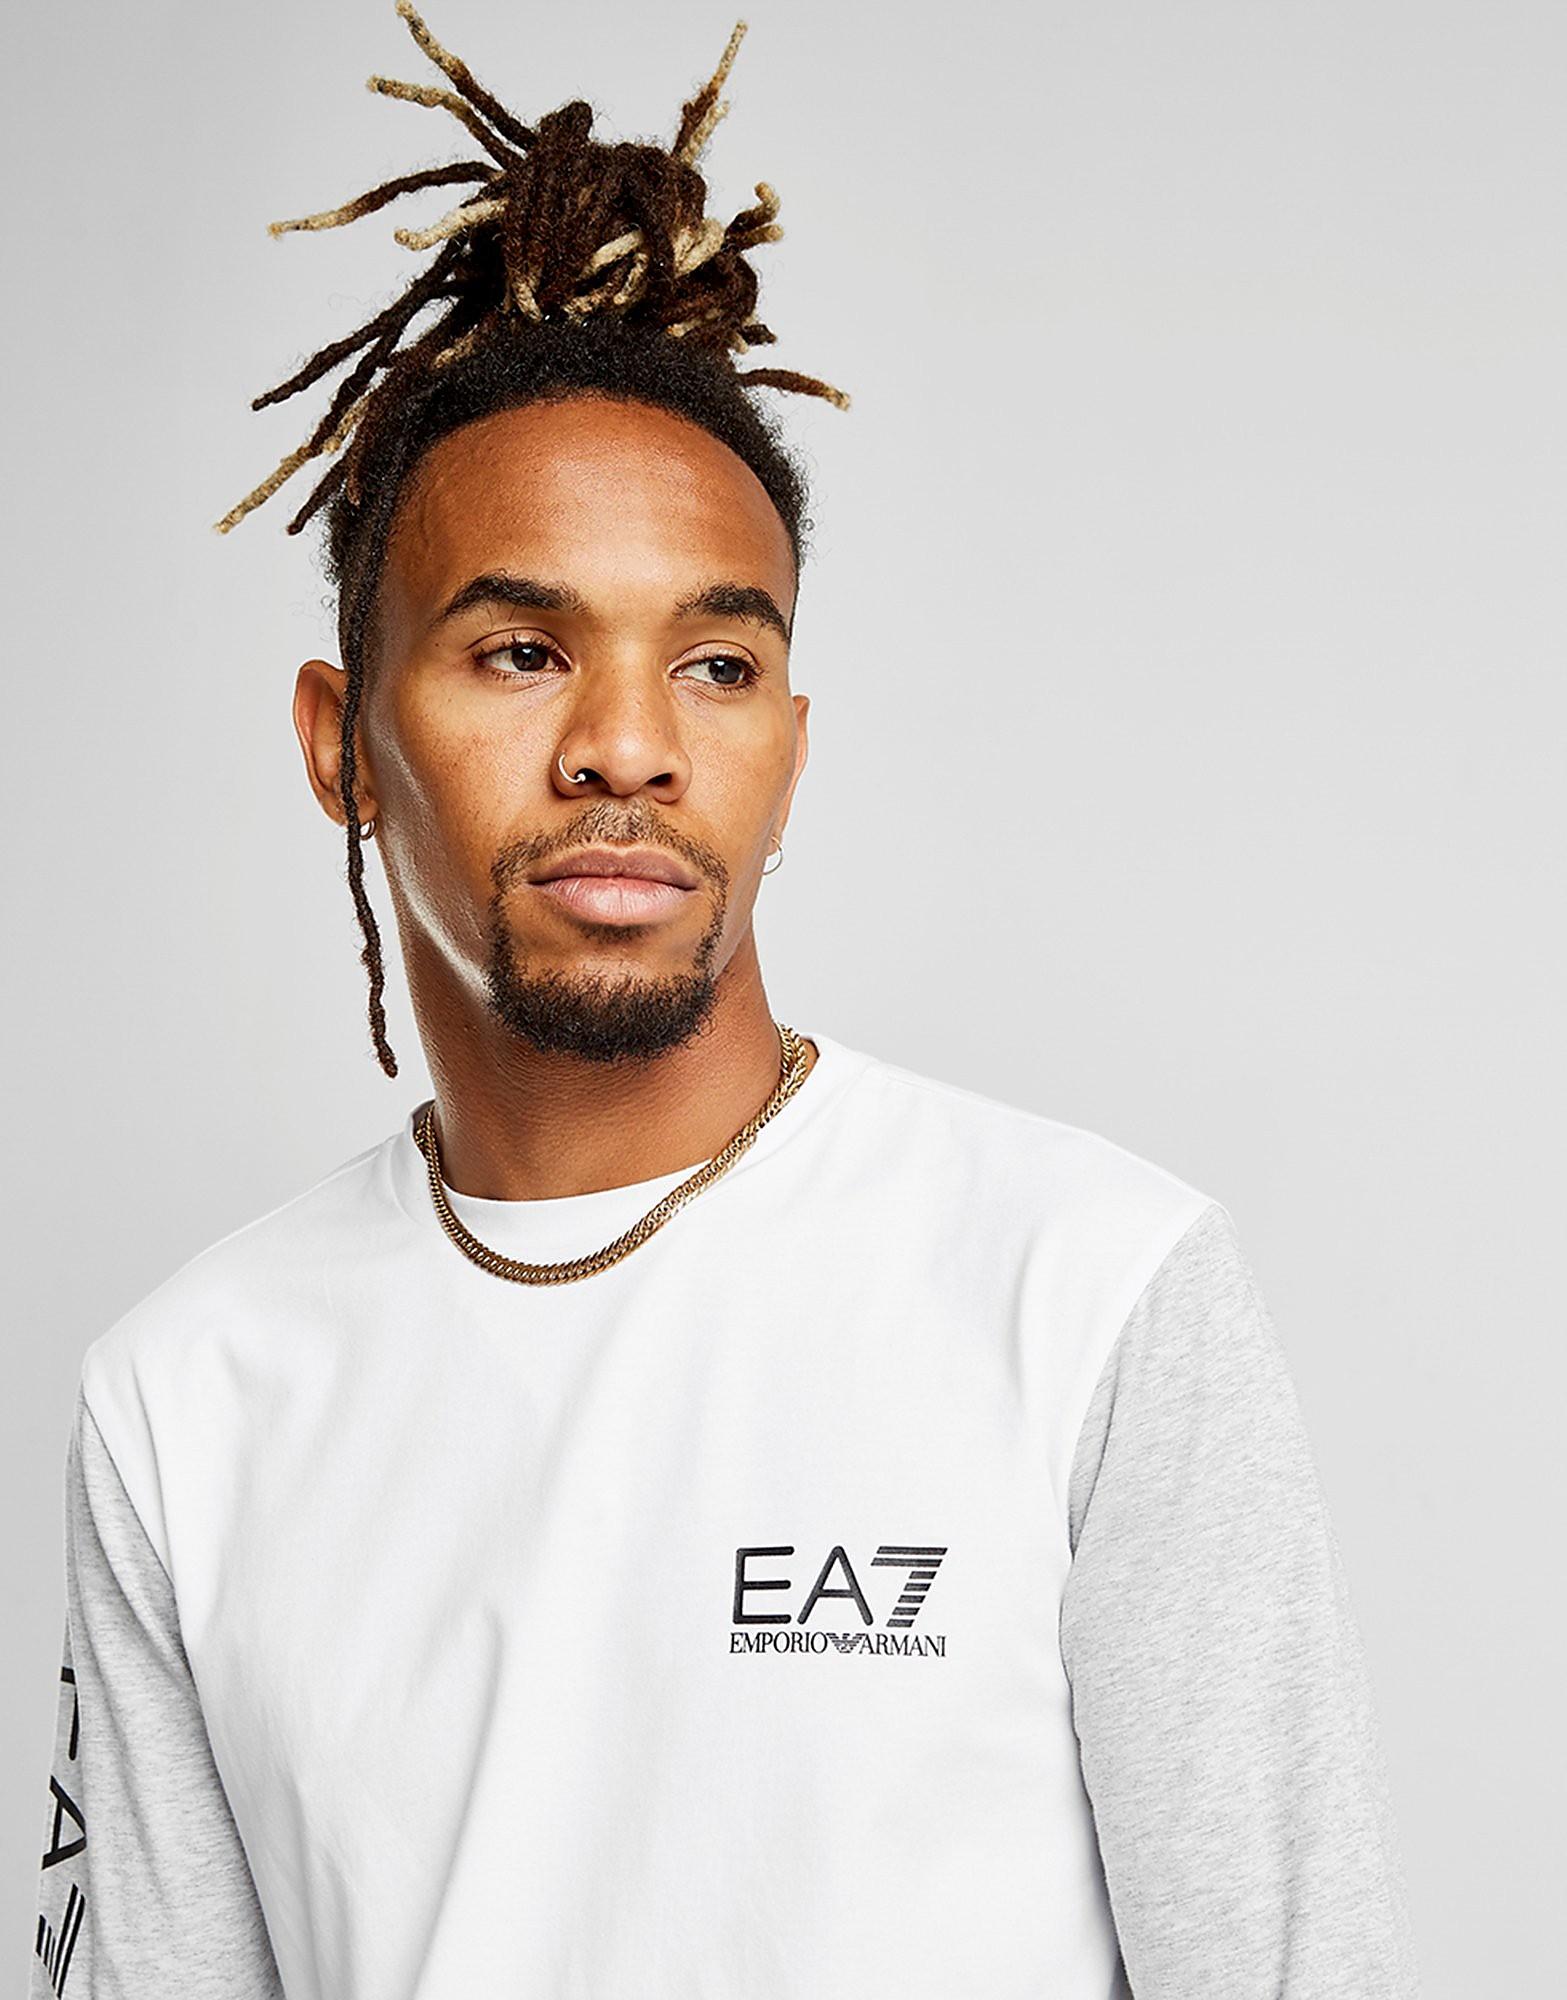 Emporio Armani EA7 Contrast Long Sleeve T-Shirt Heren